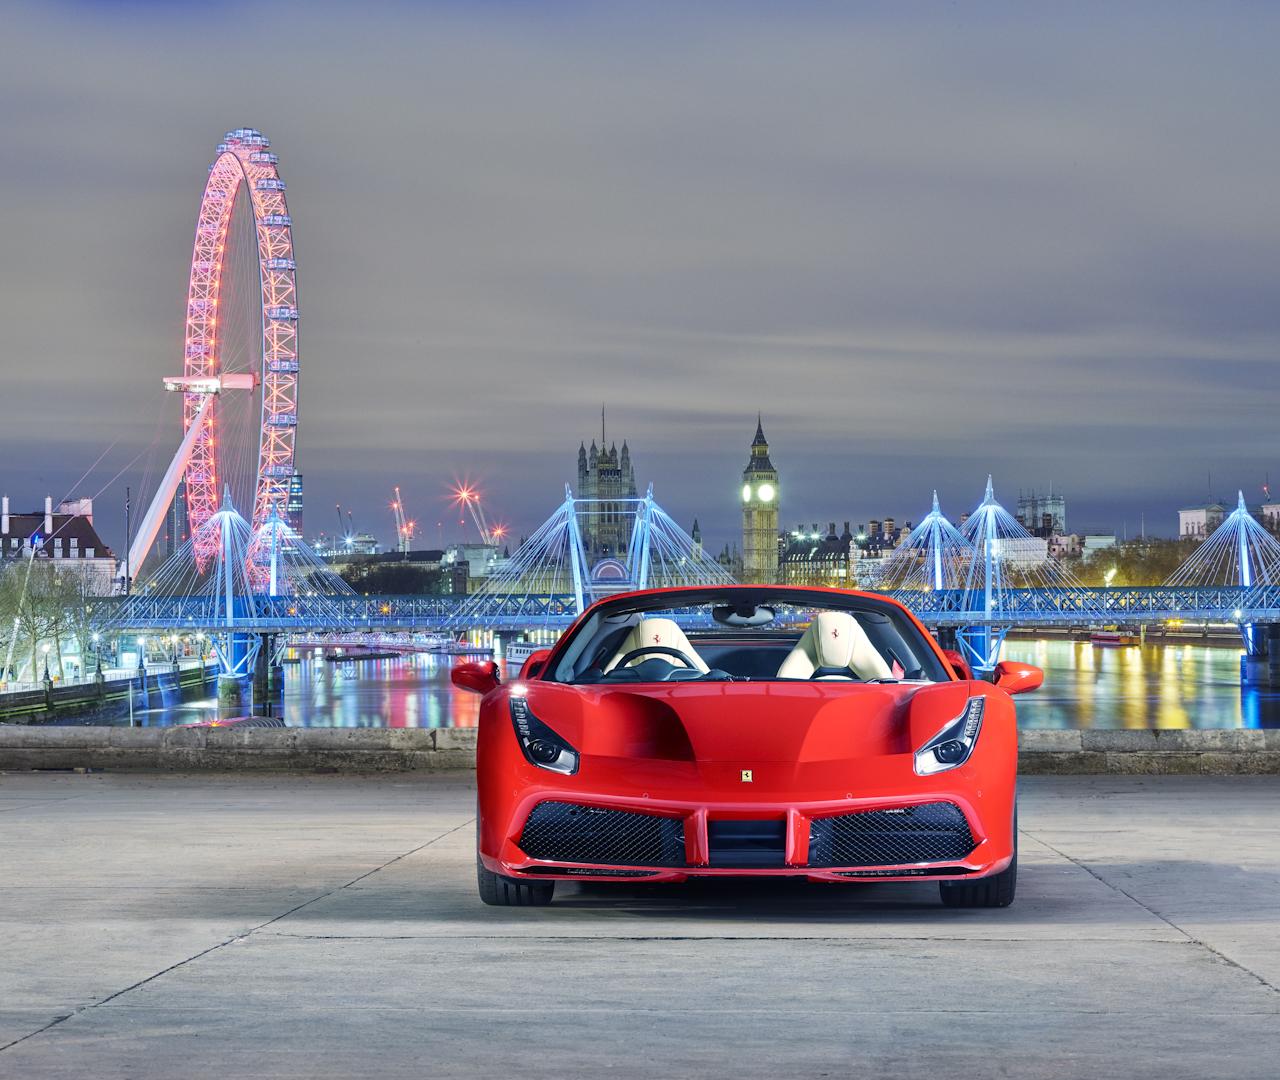 Ferrari 488 Spider ra mắt tại sự kiện VIP ở London